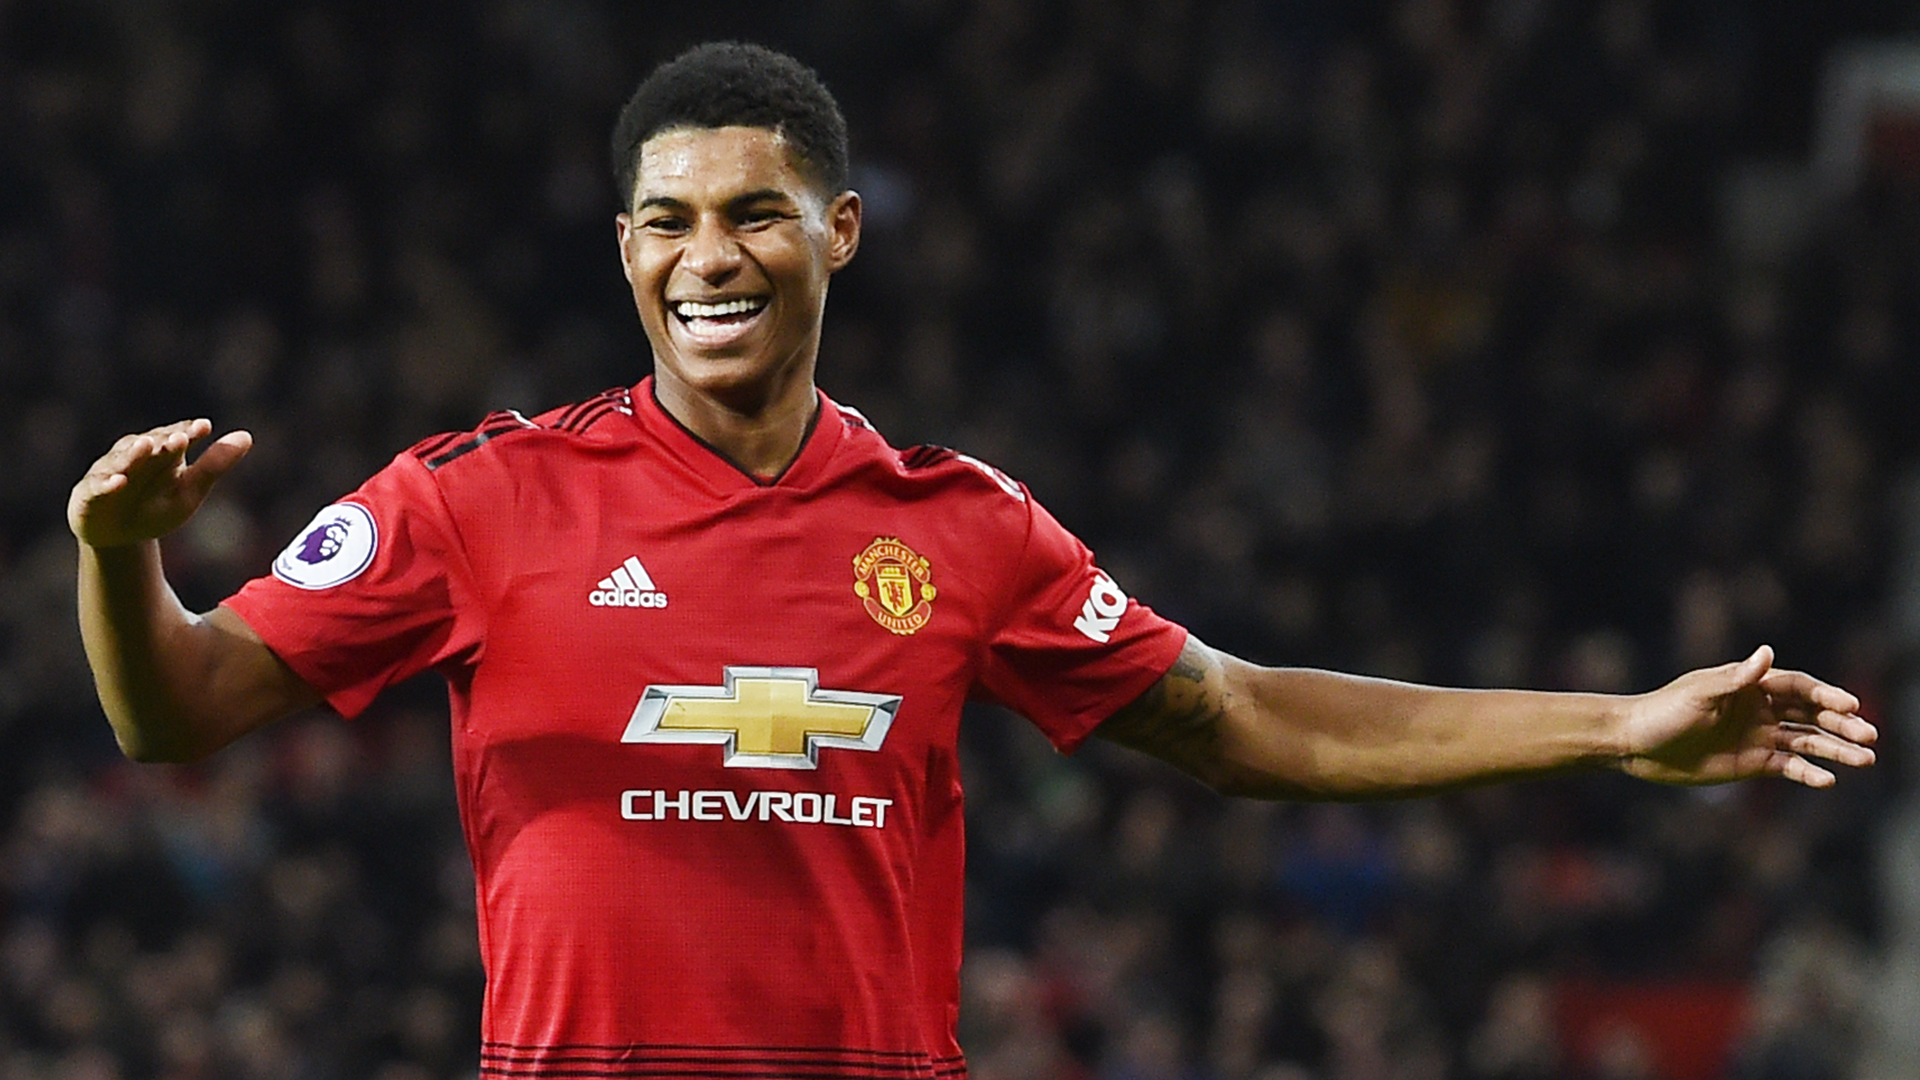 Mercato - Manchester United : Marcus Rashford prolonge jusqu'en 2023